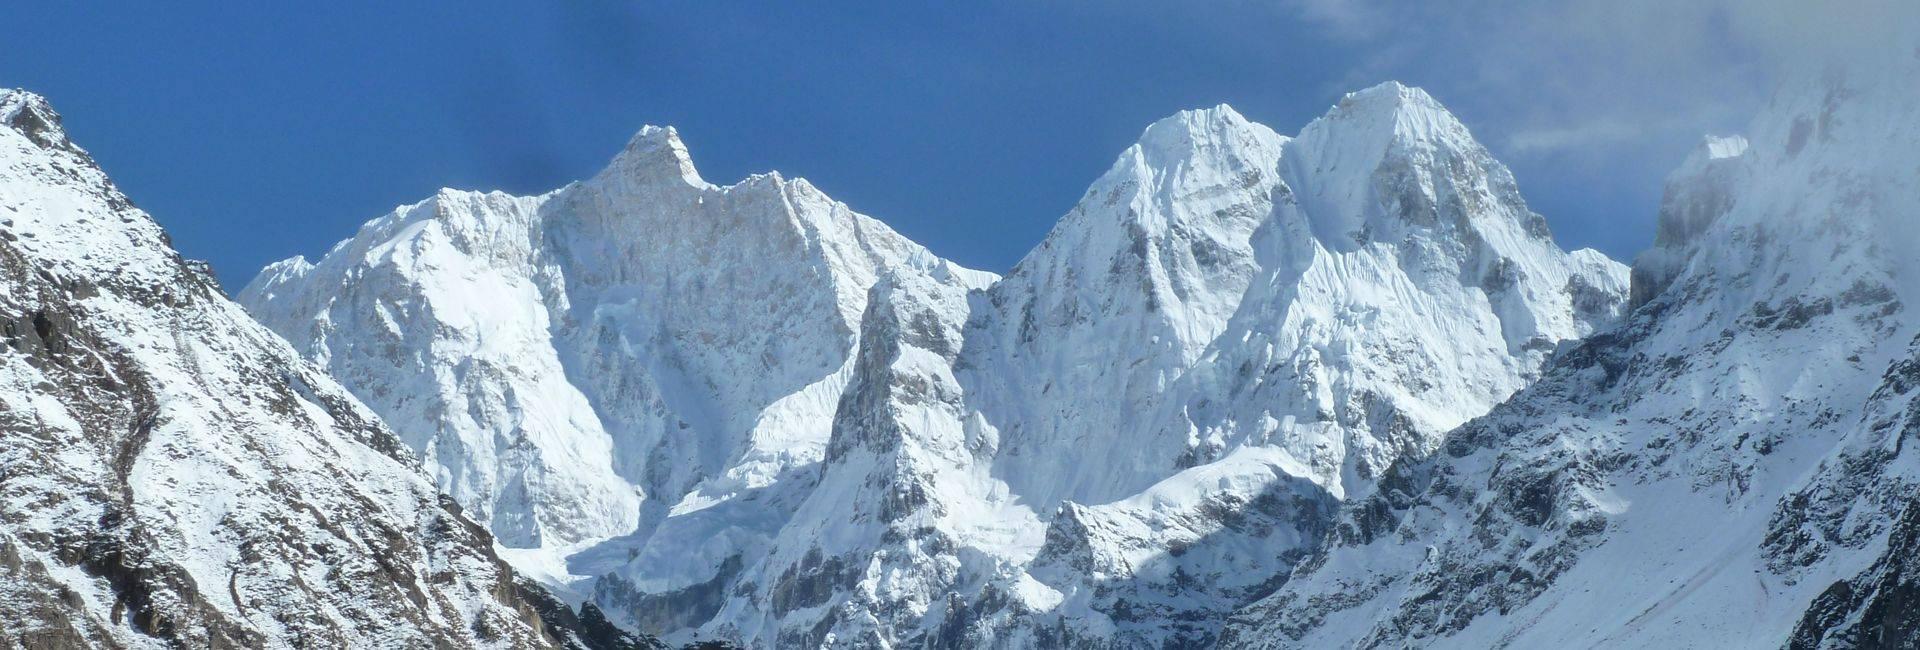 Kanchenjunga Circuit trek in Nepal